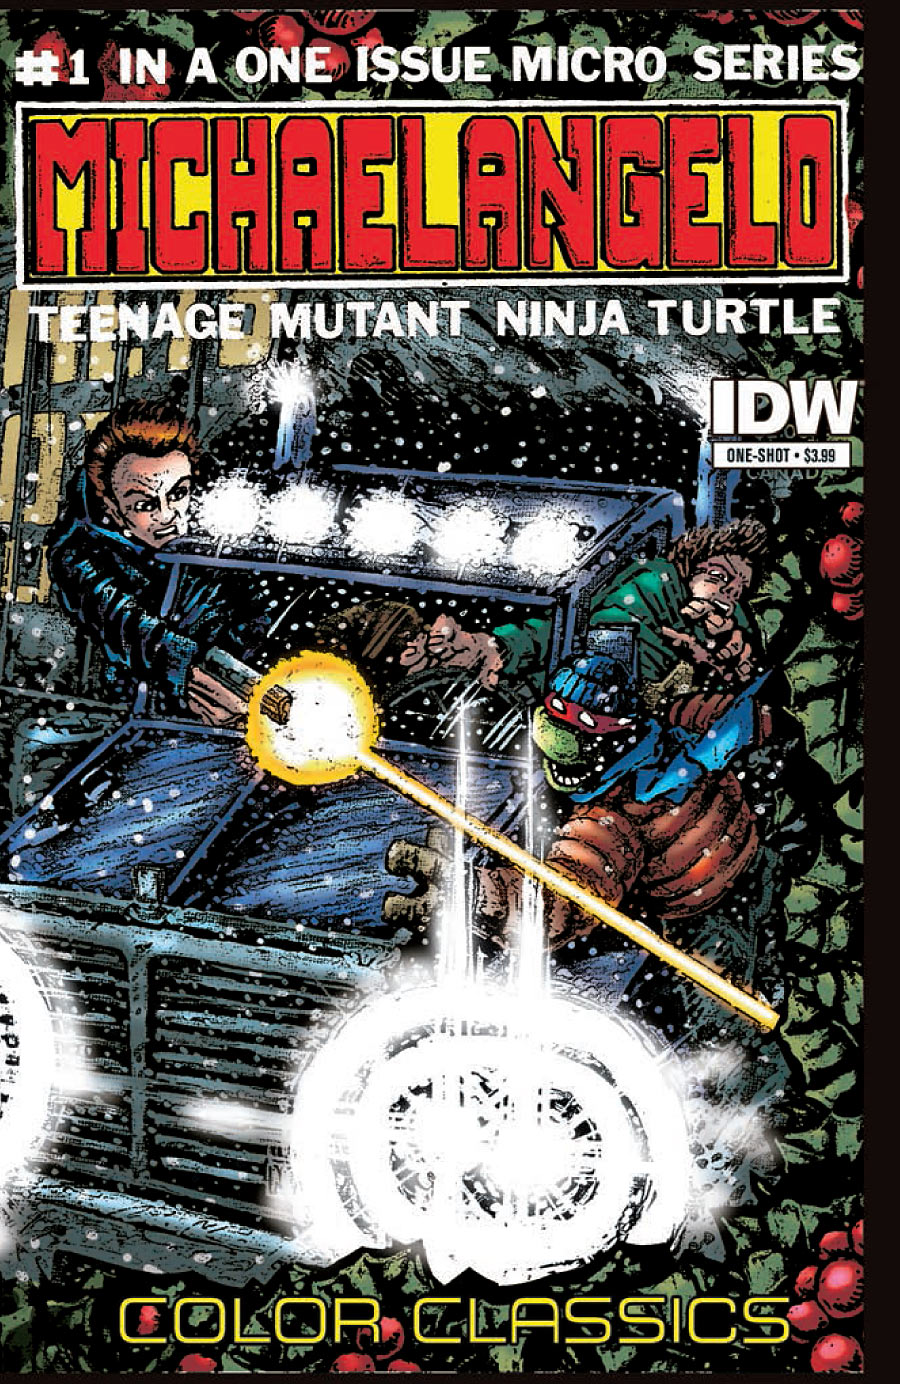 TMNT Color Classics Micro Series Michelangelo 1 c Teenage Mutant Ninja Turtles Color Classics Micro Series: Michelangelo #1 Review